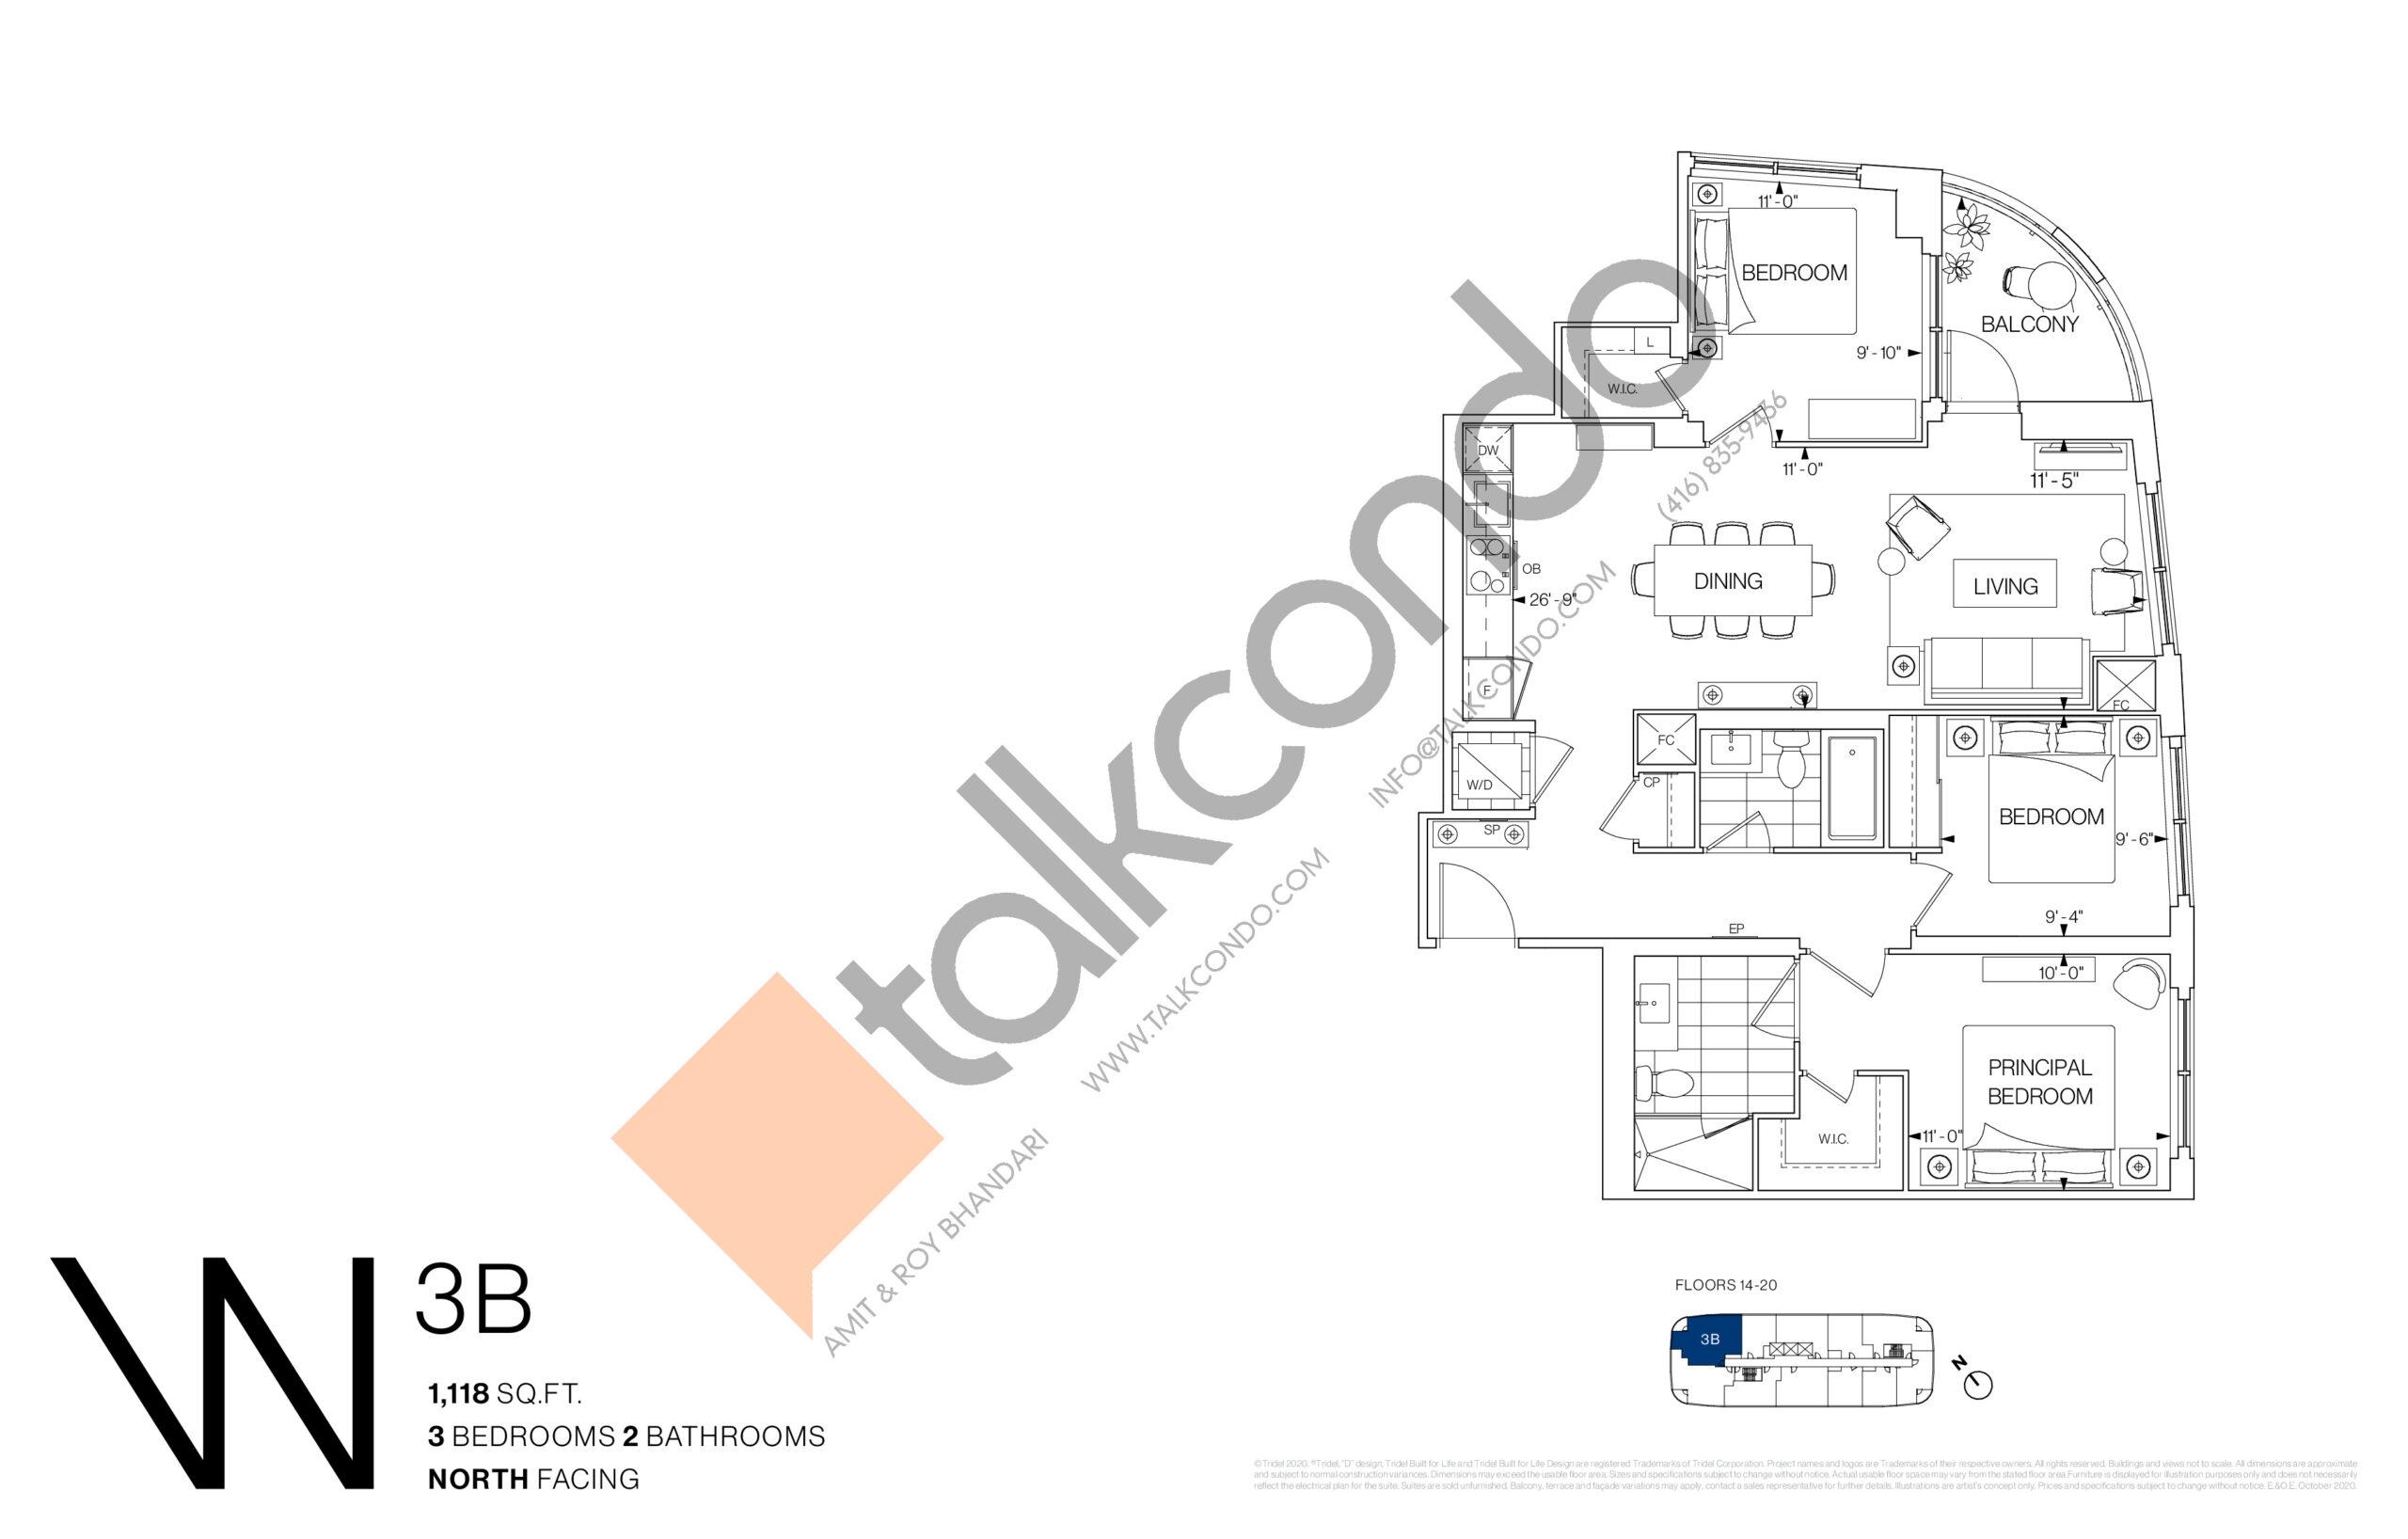 3B Floor Plan at Westerly Condos - 1118 sq.ft